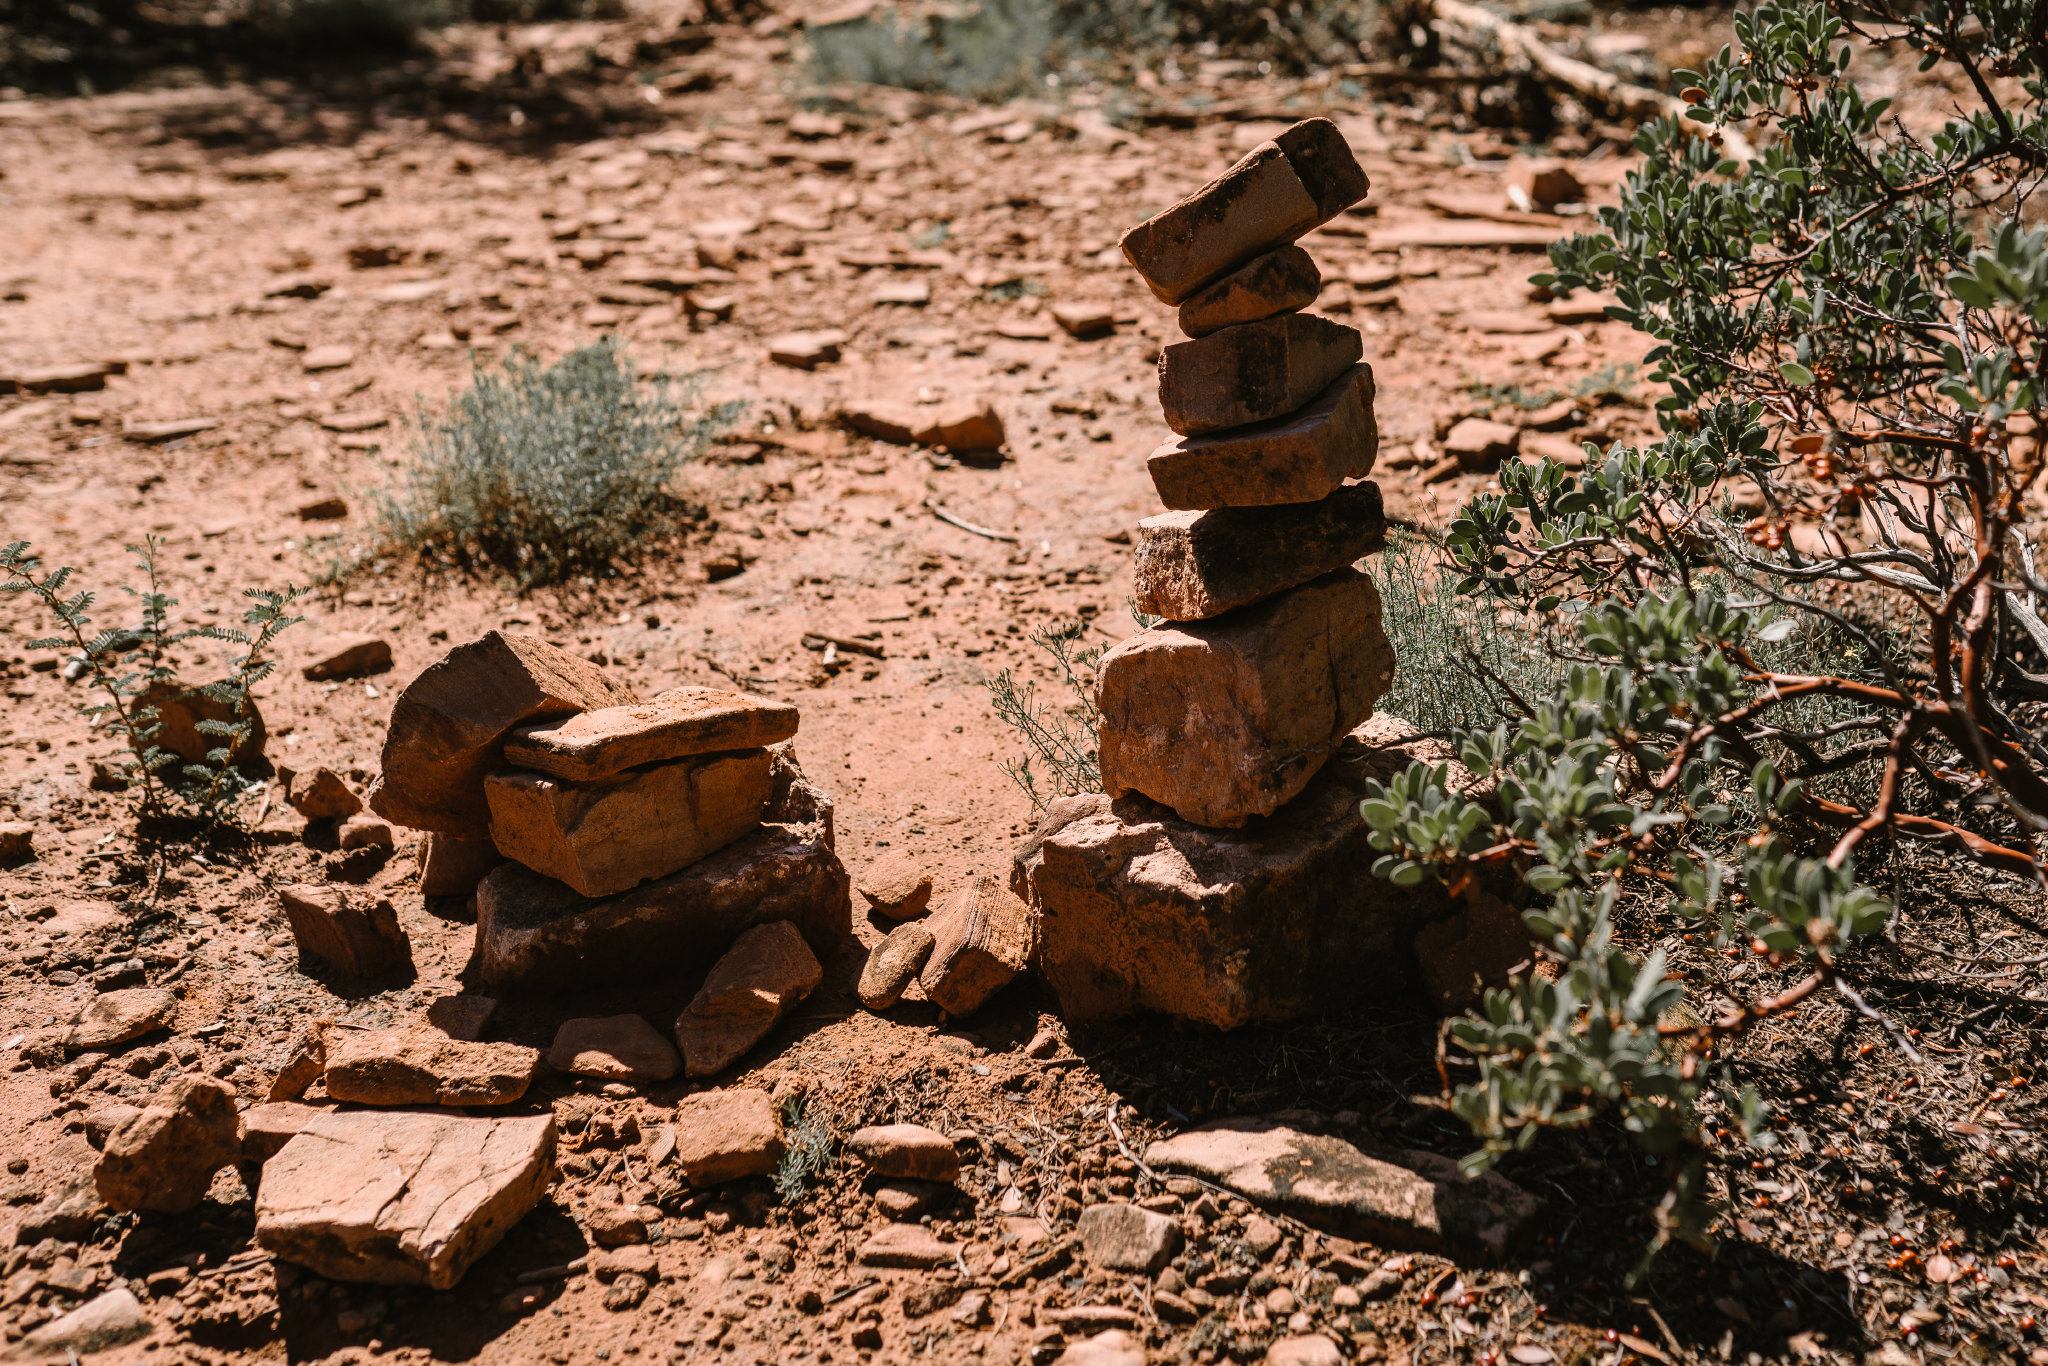 san diego wedding   photographer | collection of rocks balanced